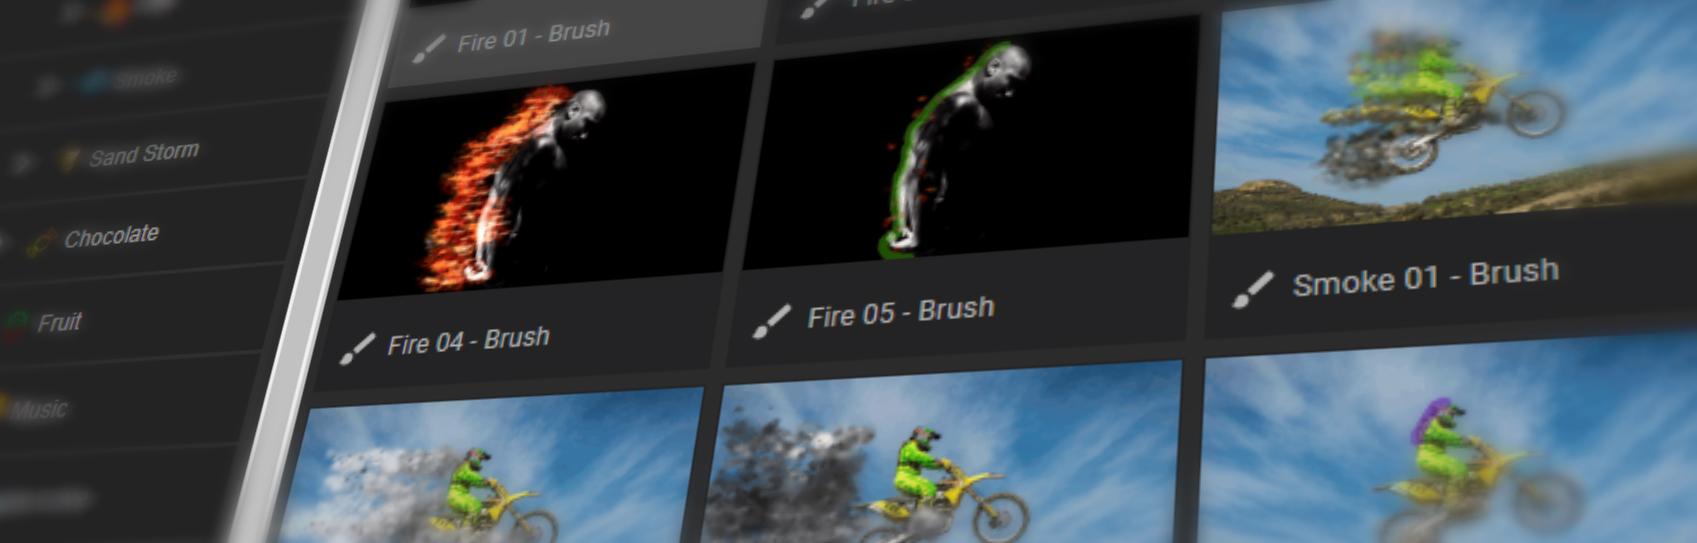 detail_brush_mode